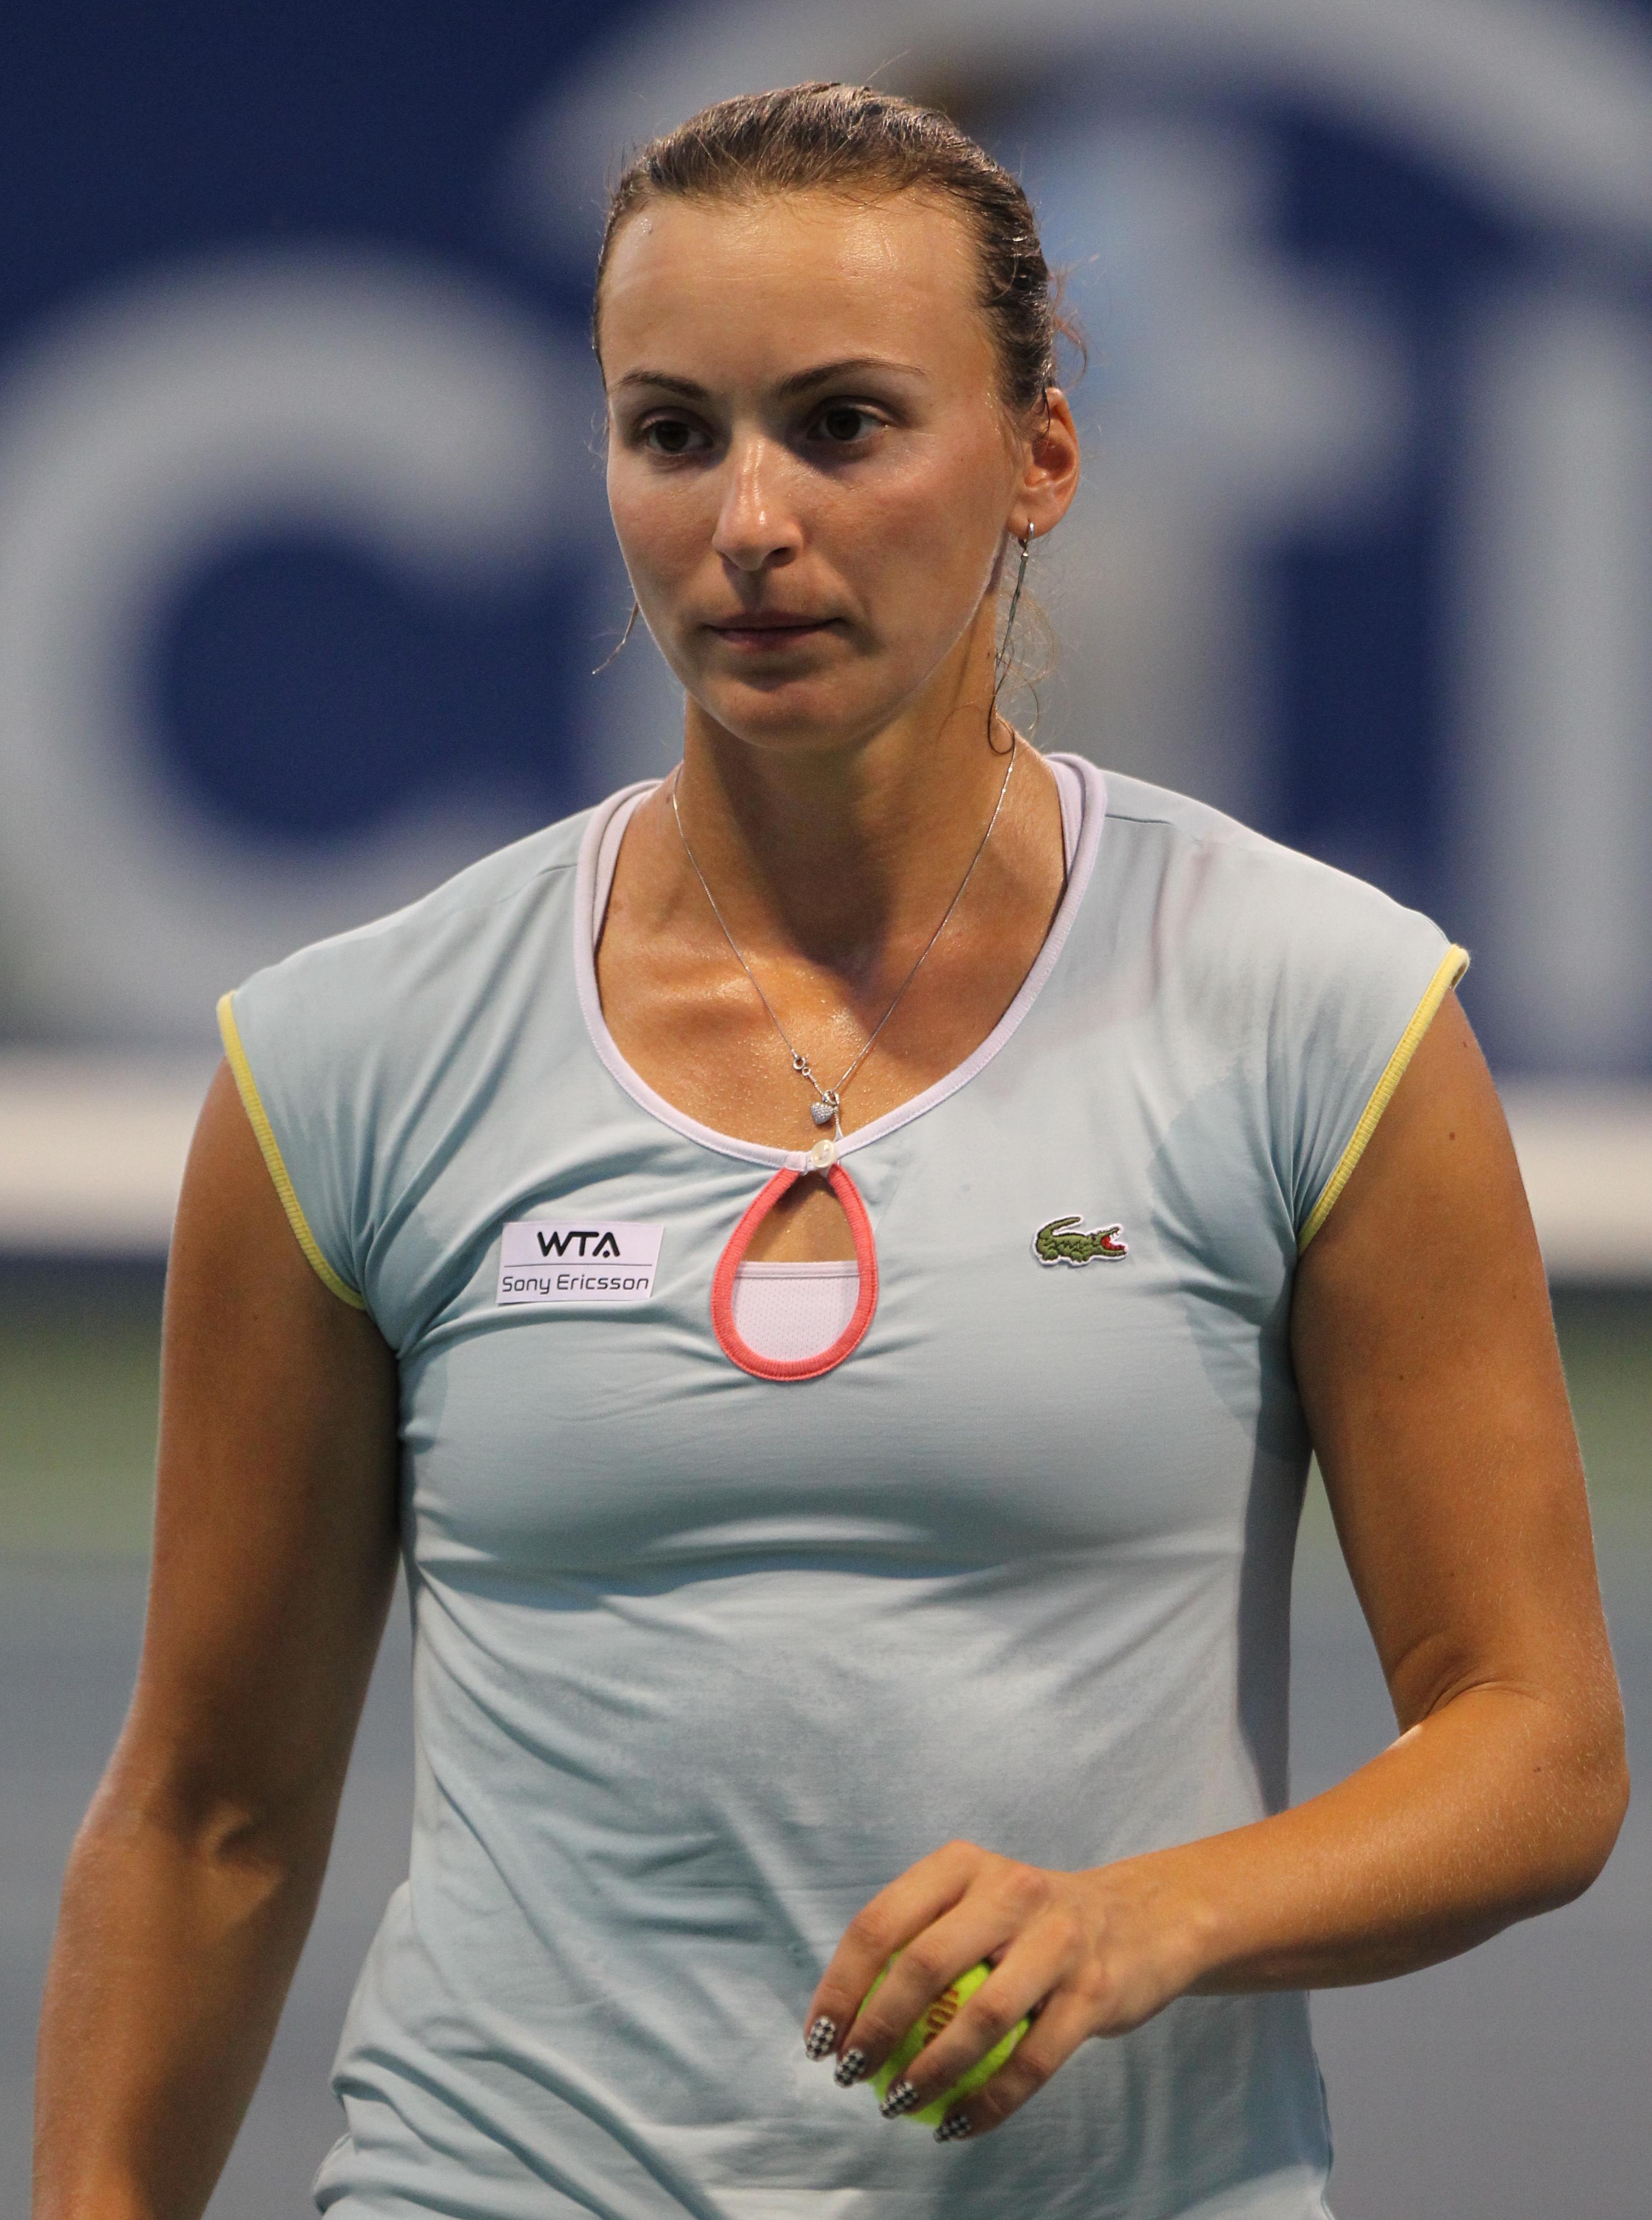 Yaroslava Shvedova